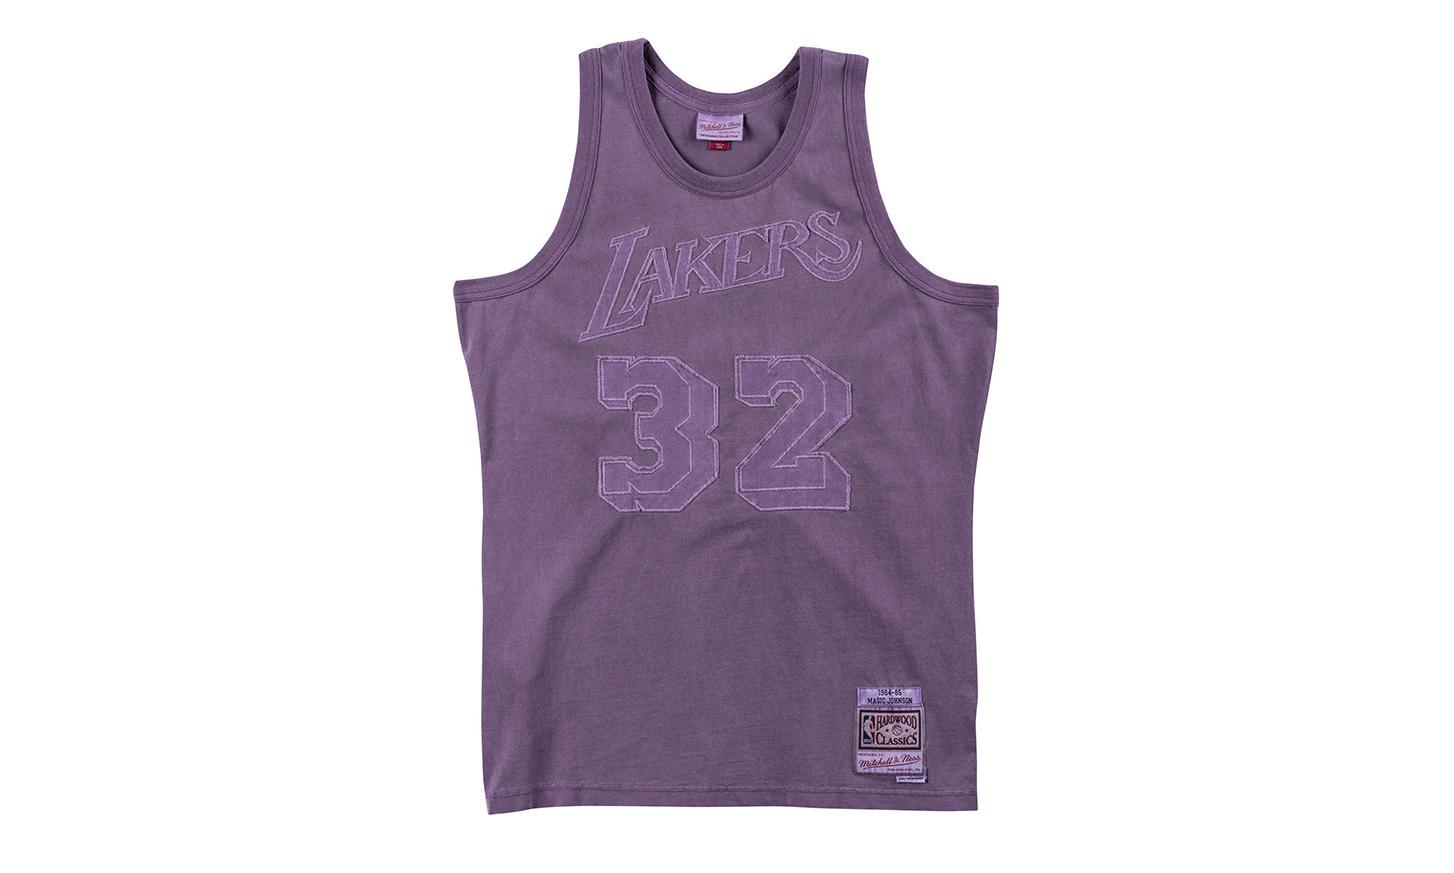 Mitchell & Ness 推出褪色 NBA 球衫